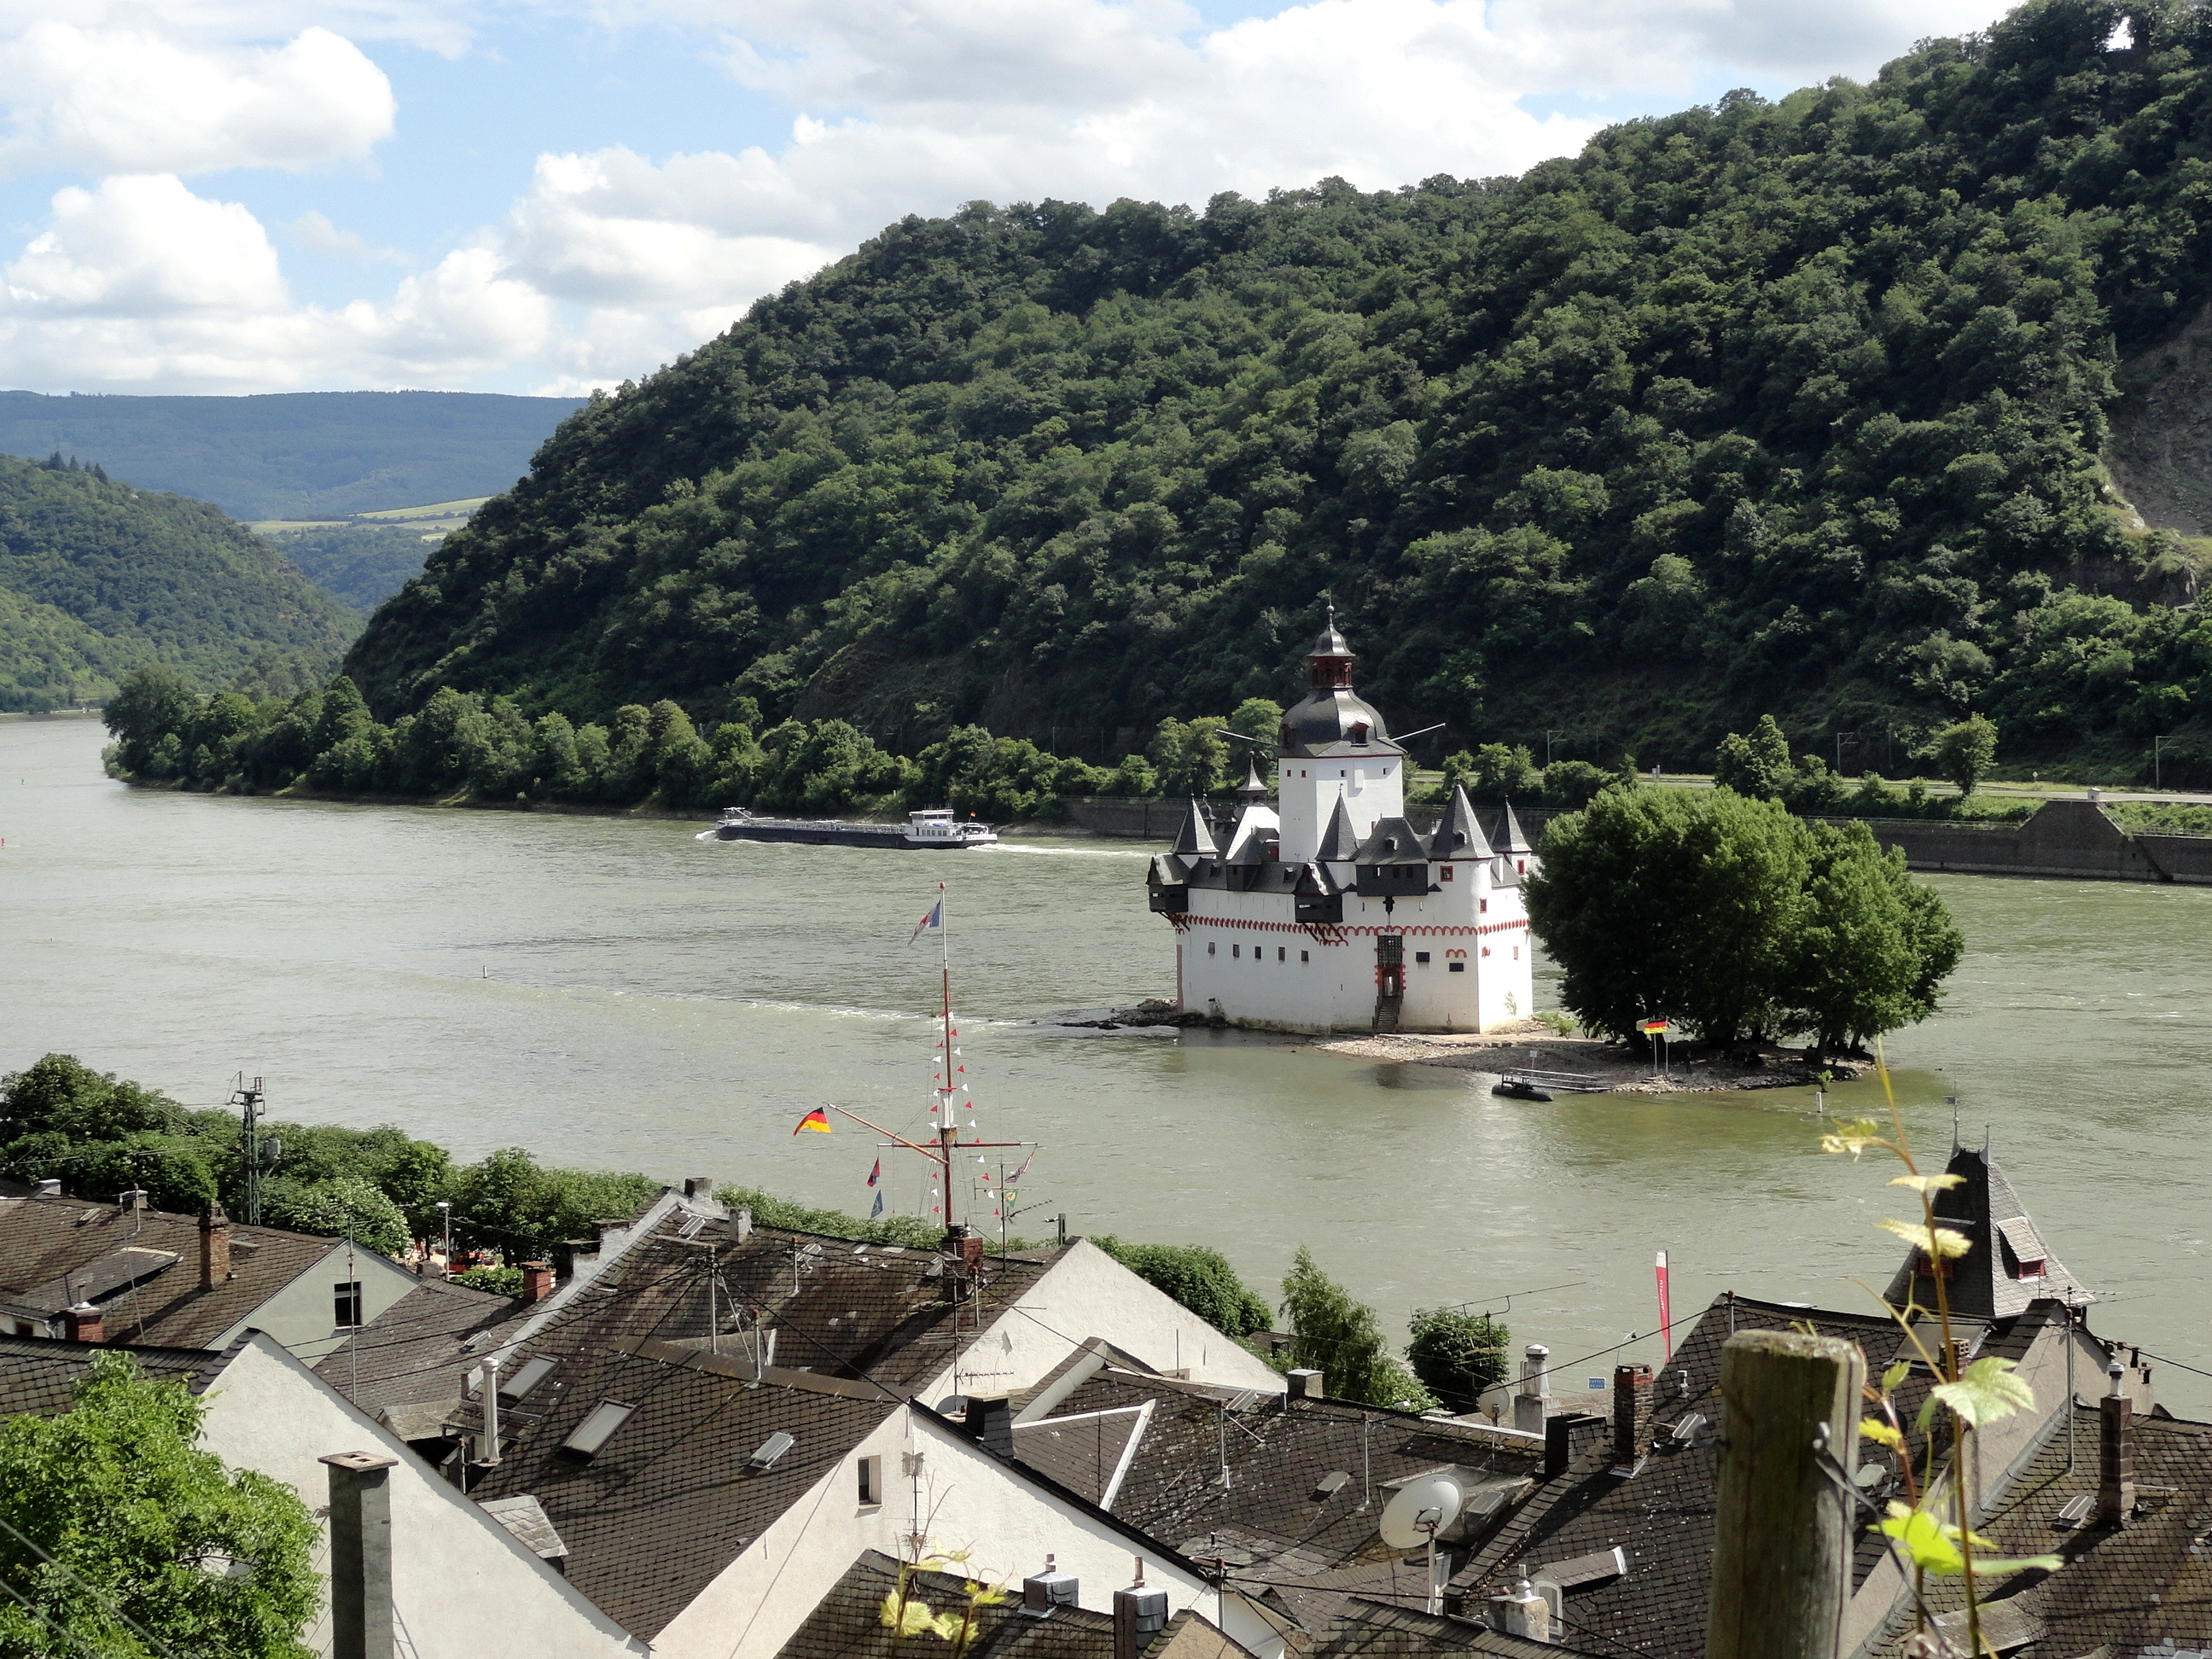 Kaub Rhein